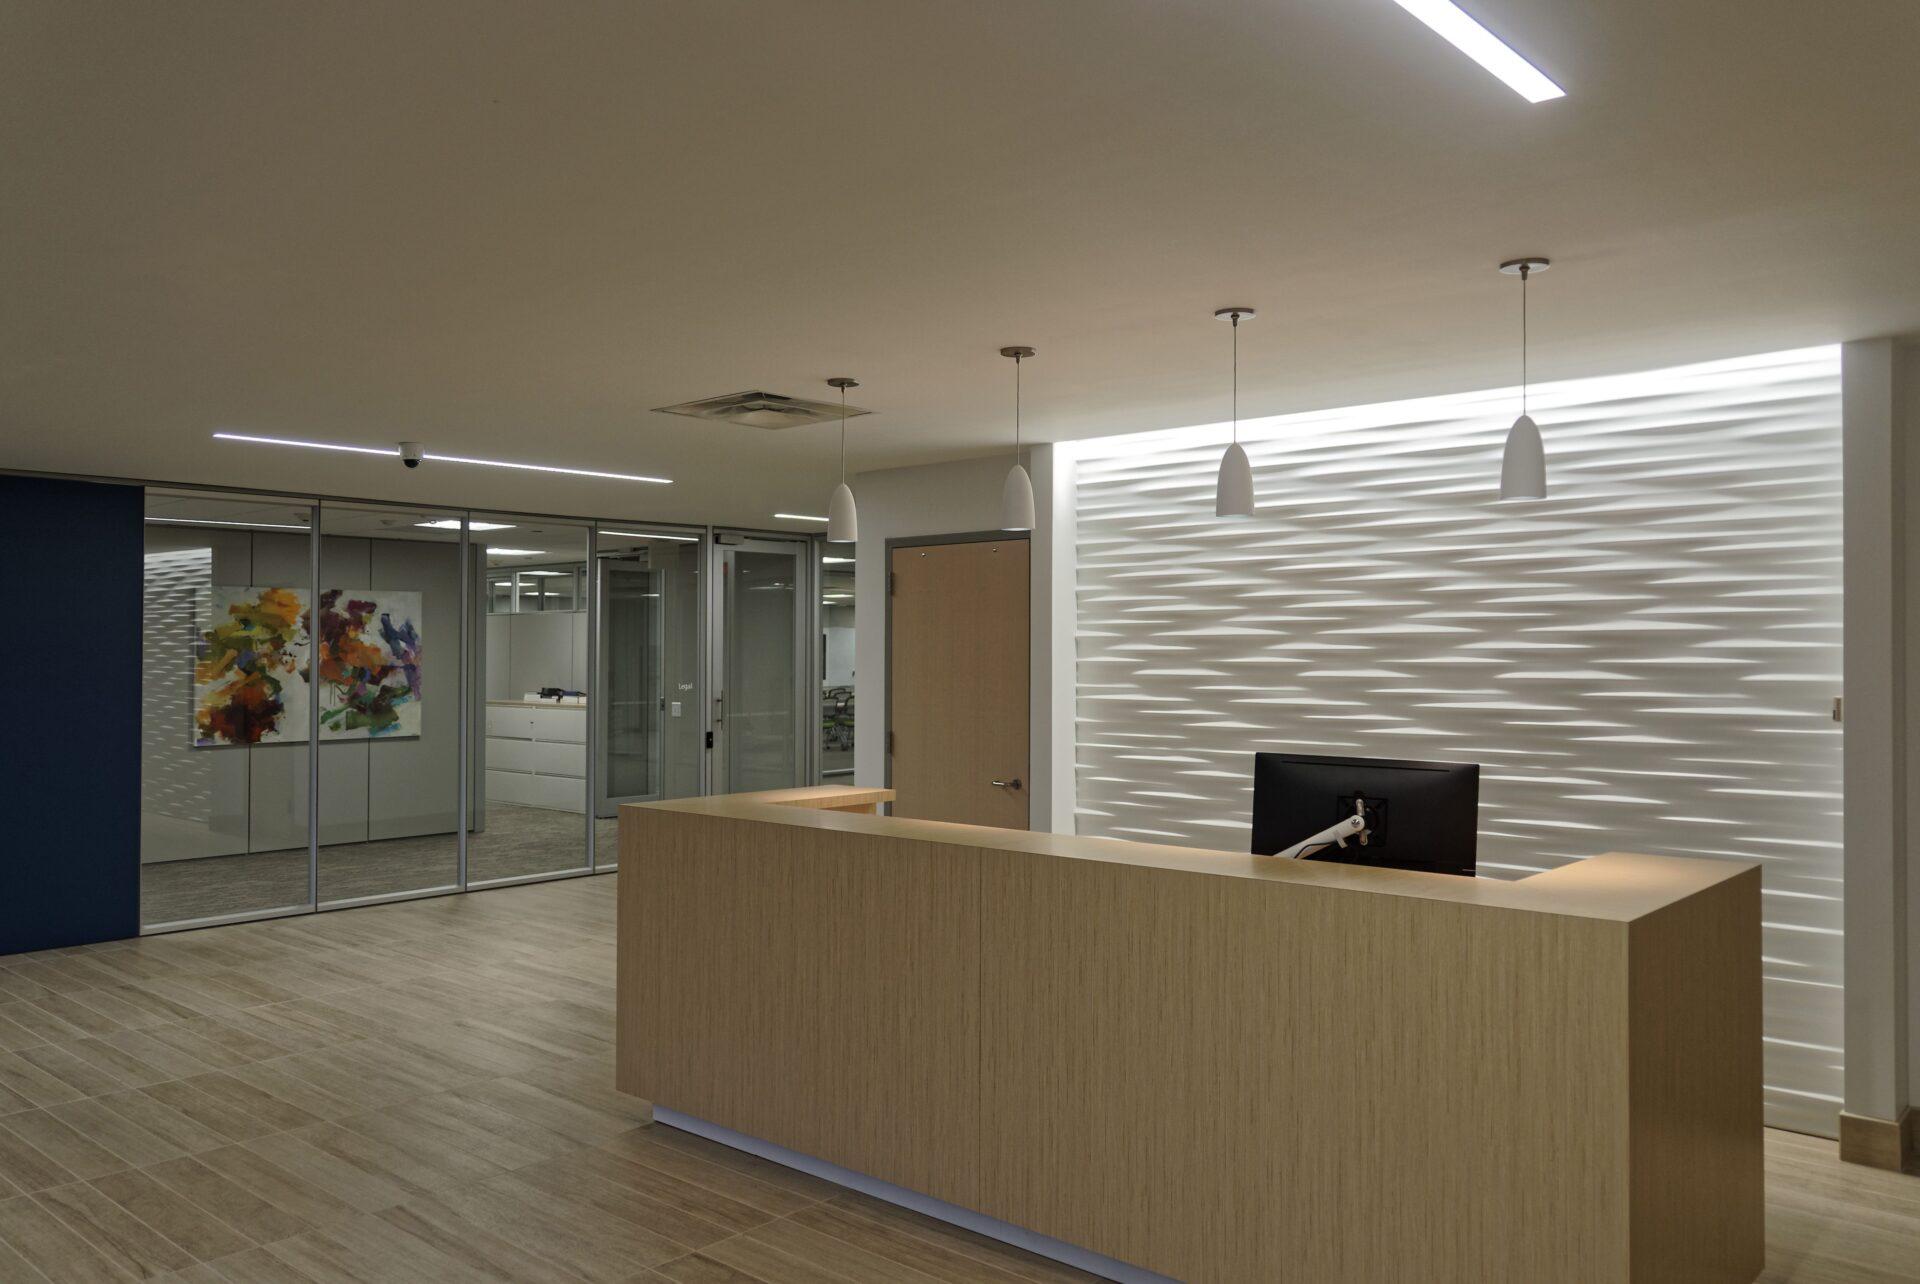 Affiliates Management Company Tenant Improvement